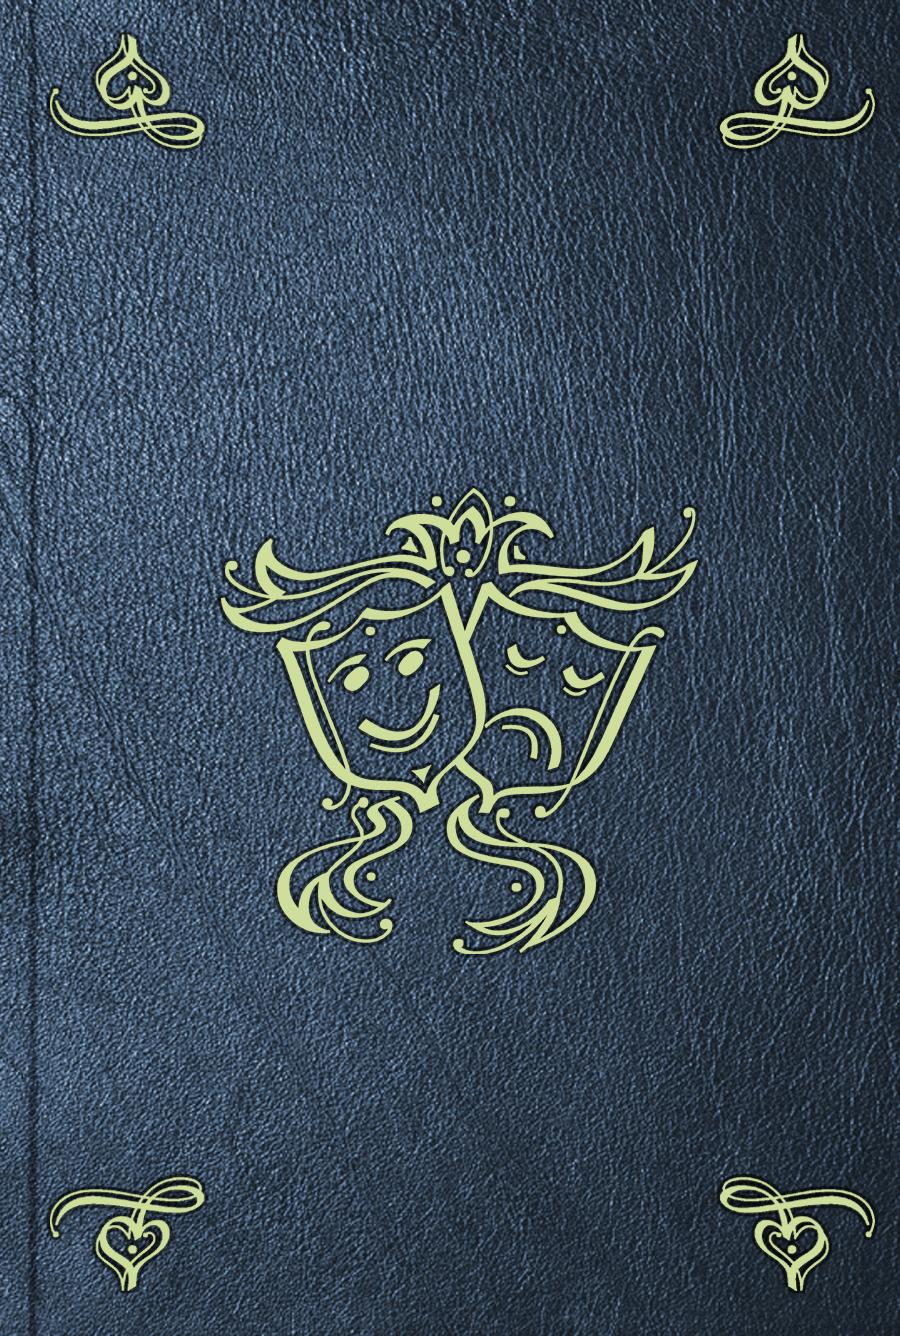 William Congreve The works. Vol. 1 чайник василиса ва 1022 brown